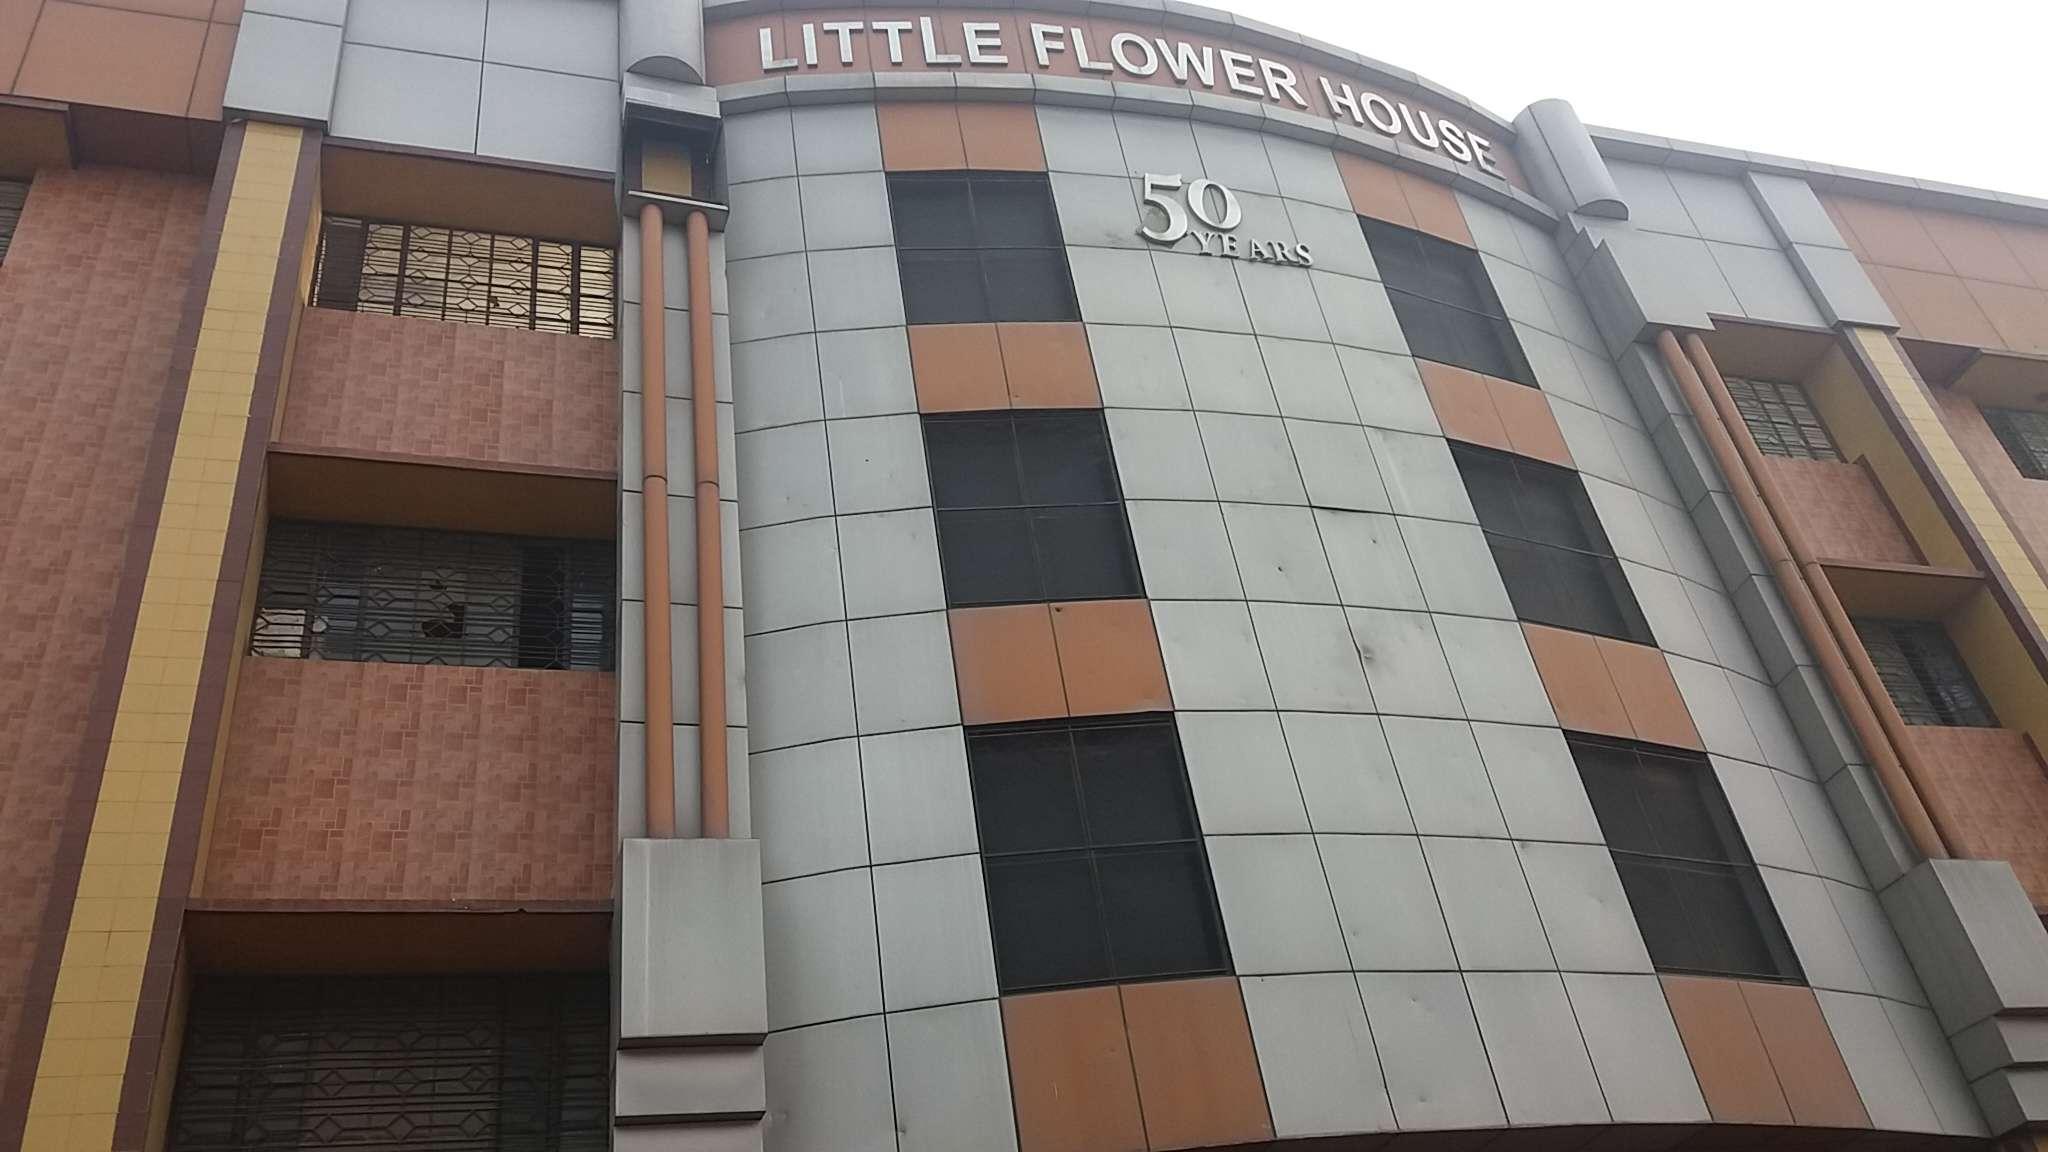 LITTLE FLOWER HOUSE PLOT NO 442 KAKARMATTA VARANASI UTTAR PRADESH 2130134